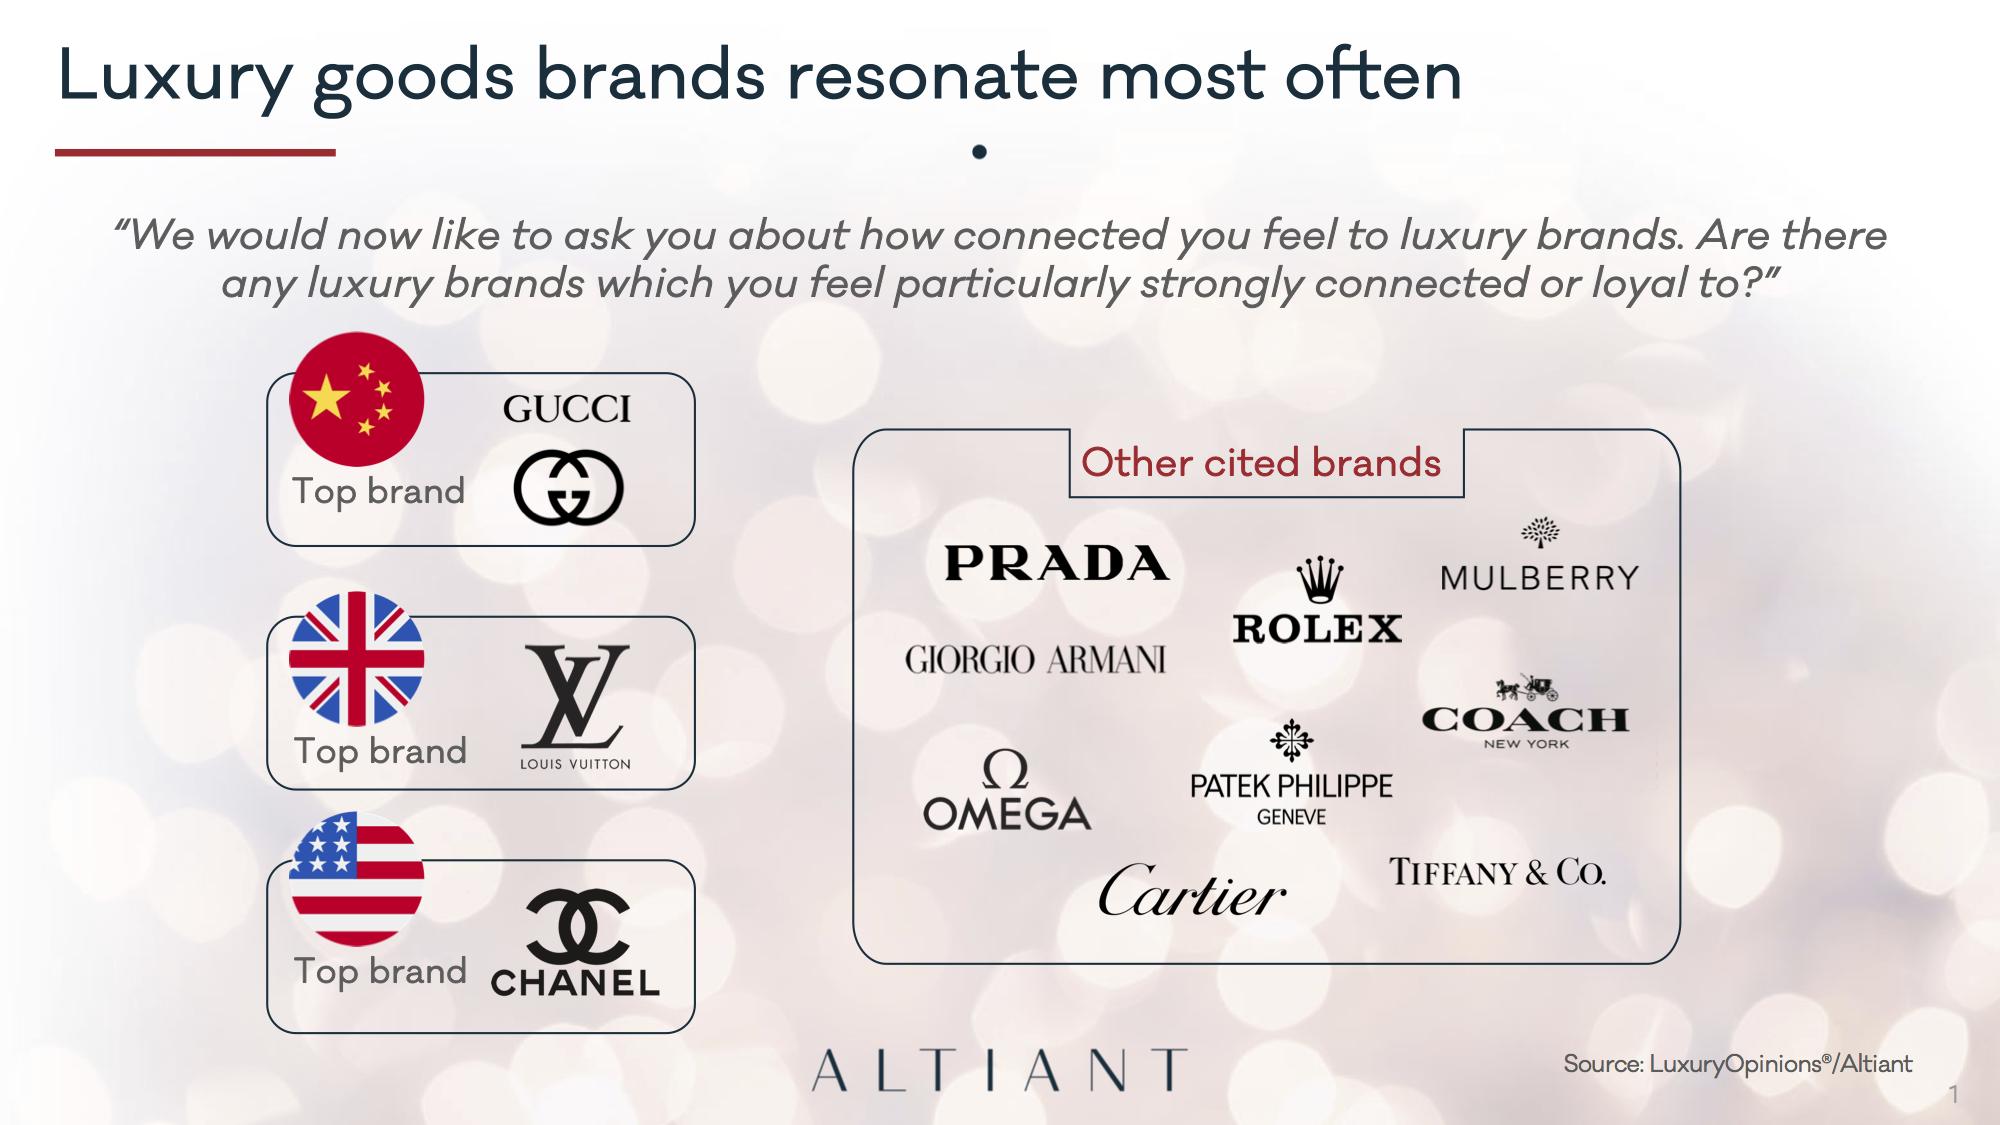 Altiant Key Luxury Trends p12 copy.png